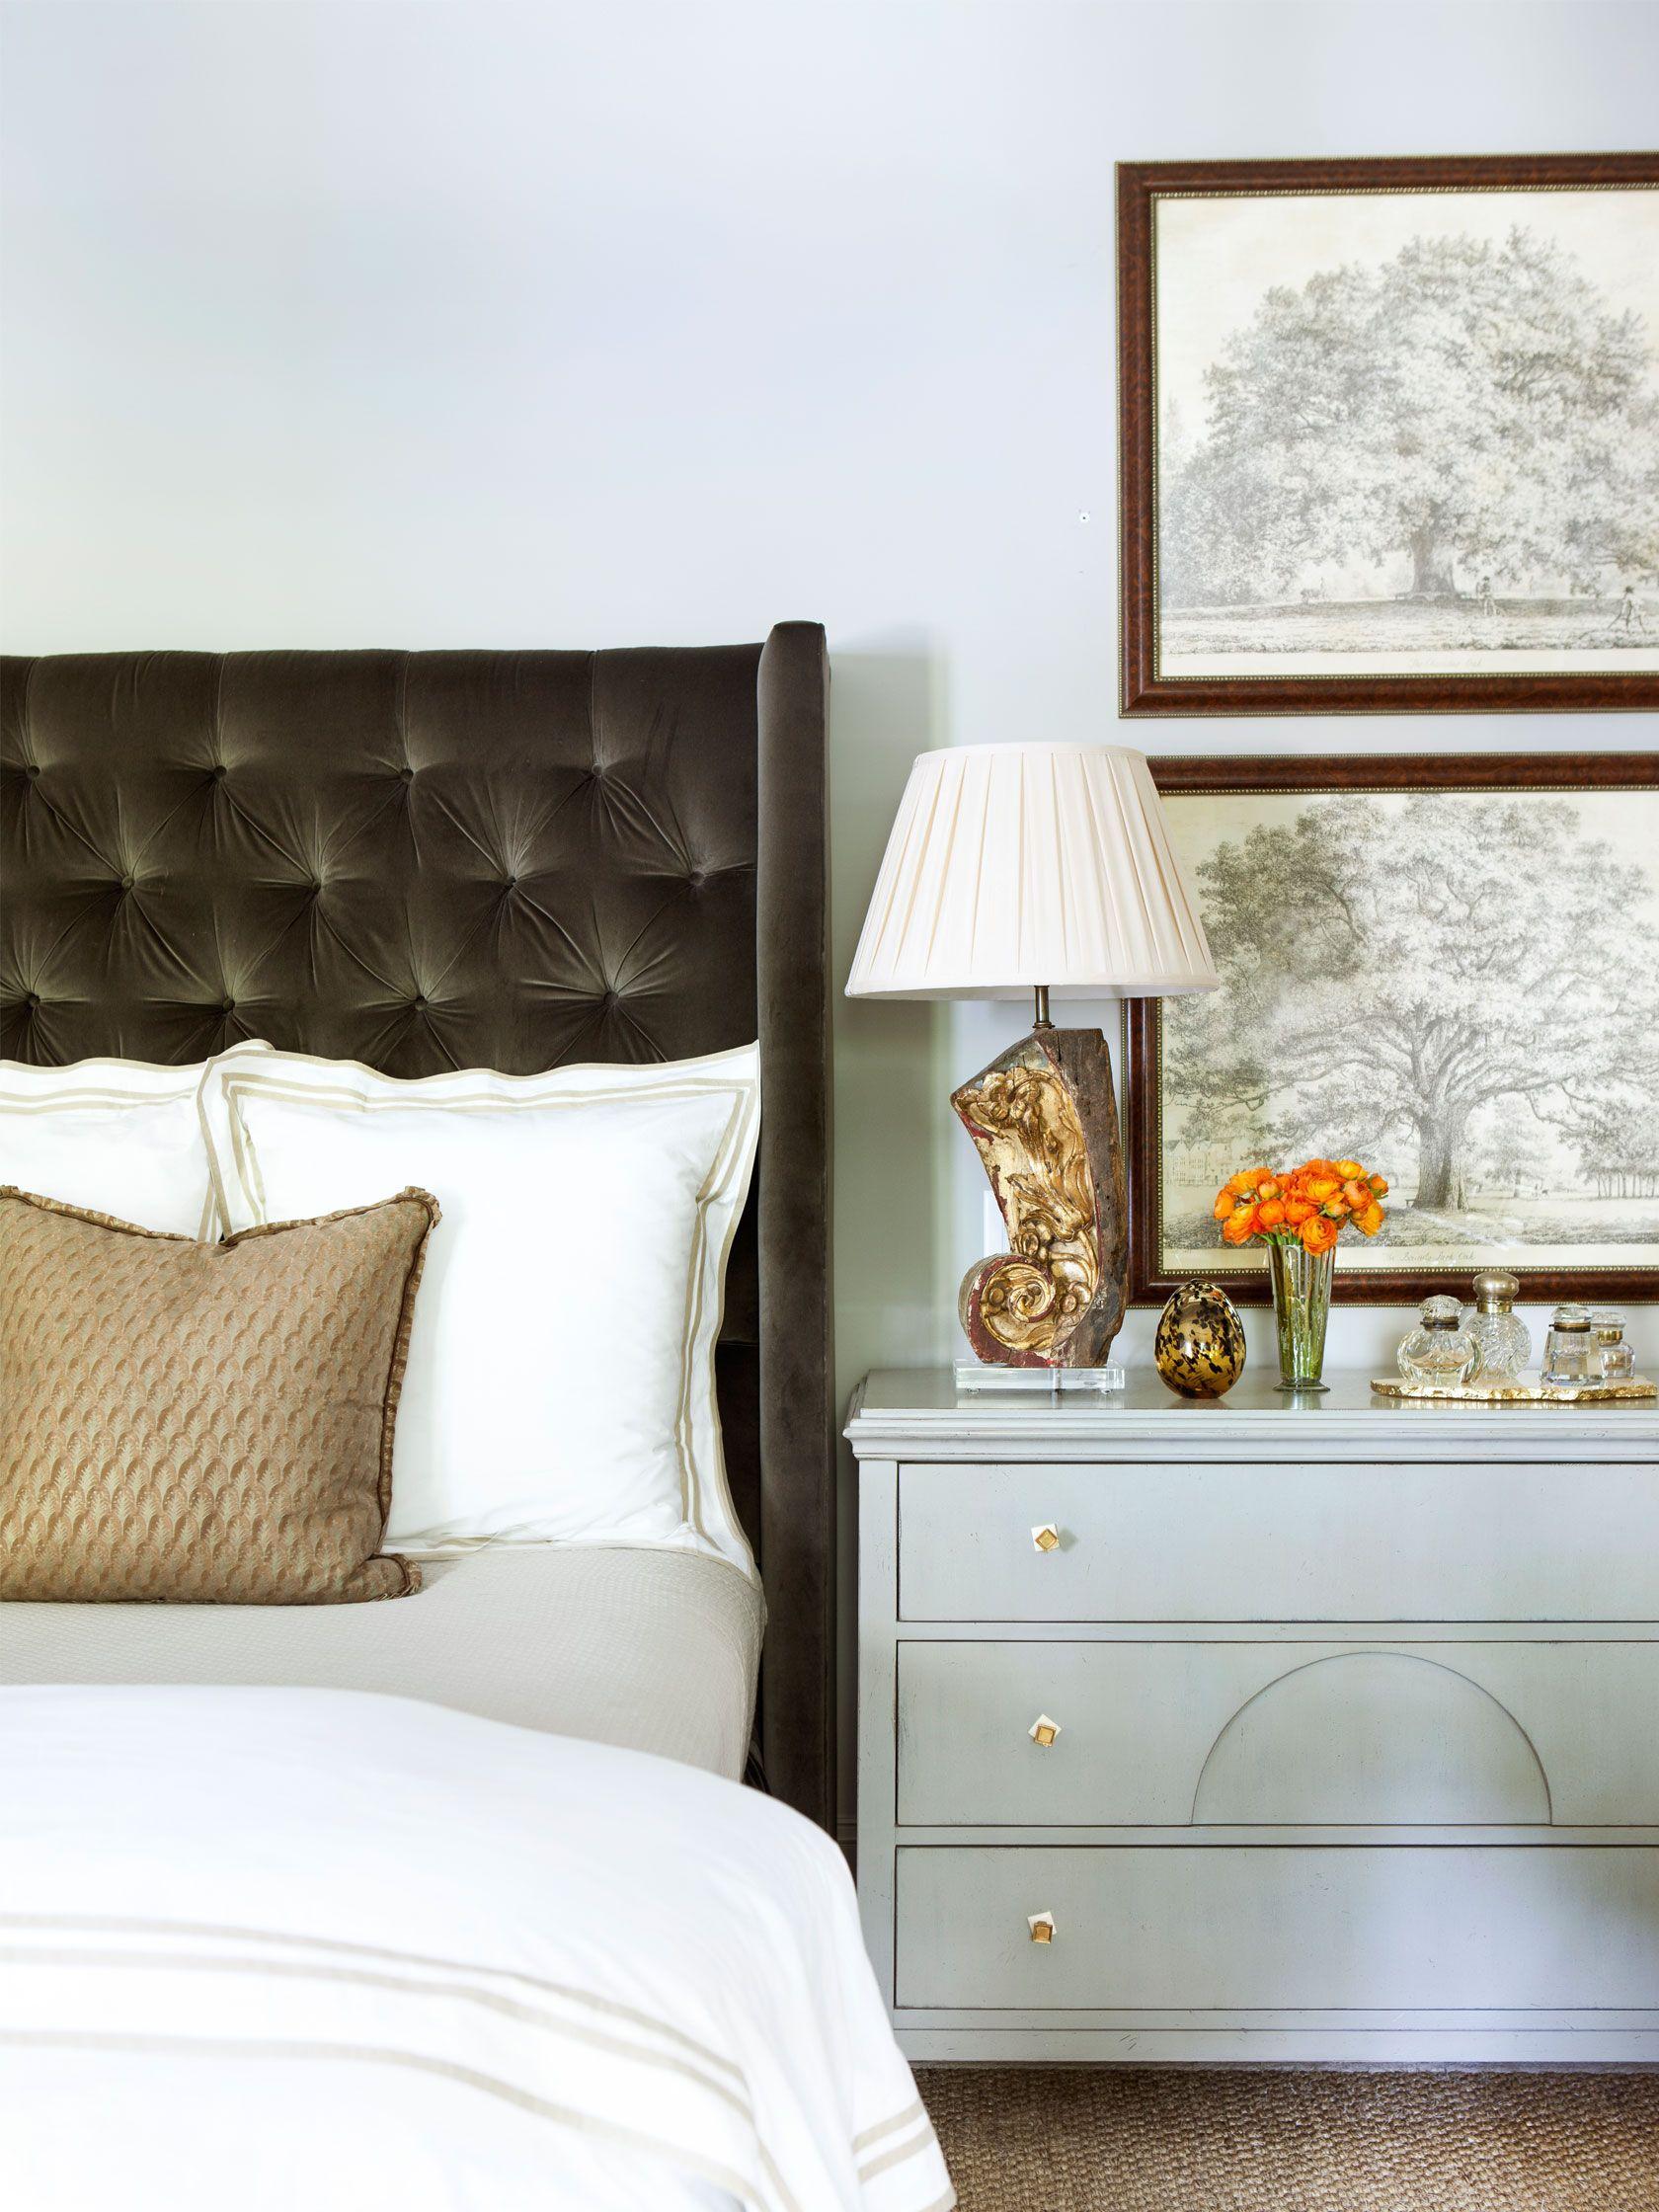 Tuxedo Park Amy Morris Interiors Master bedrooms decor